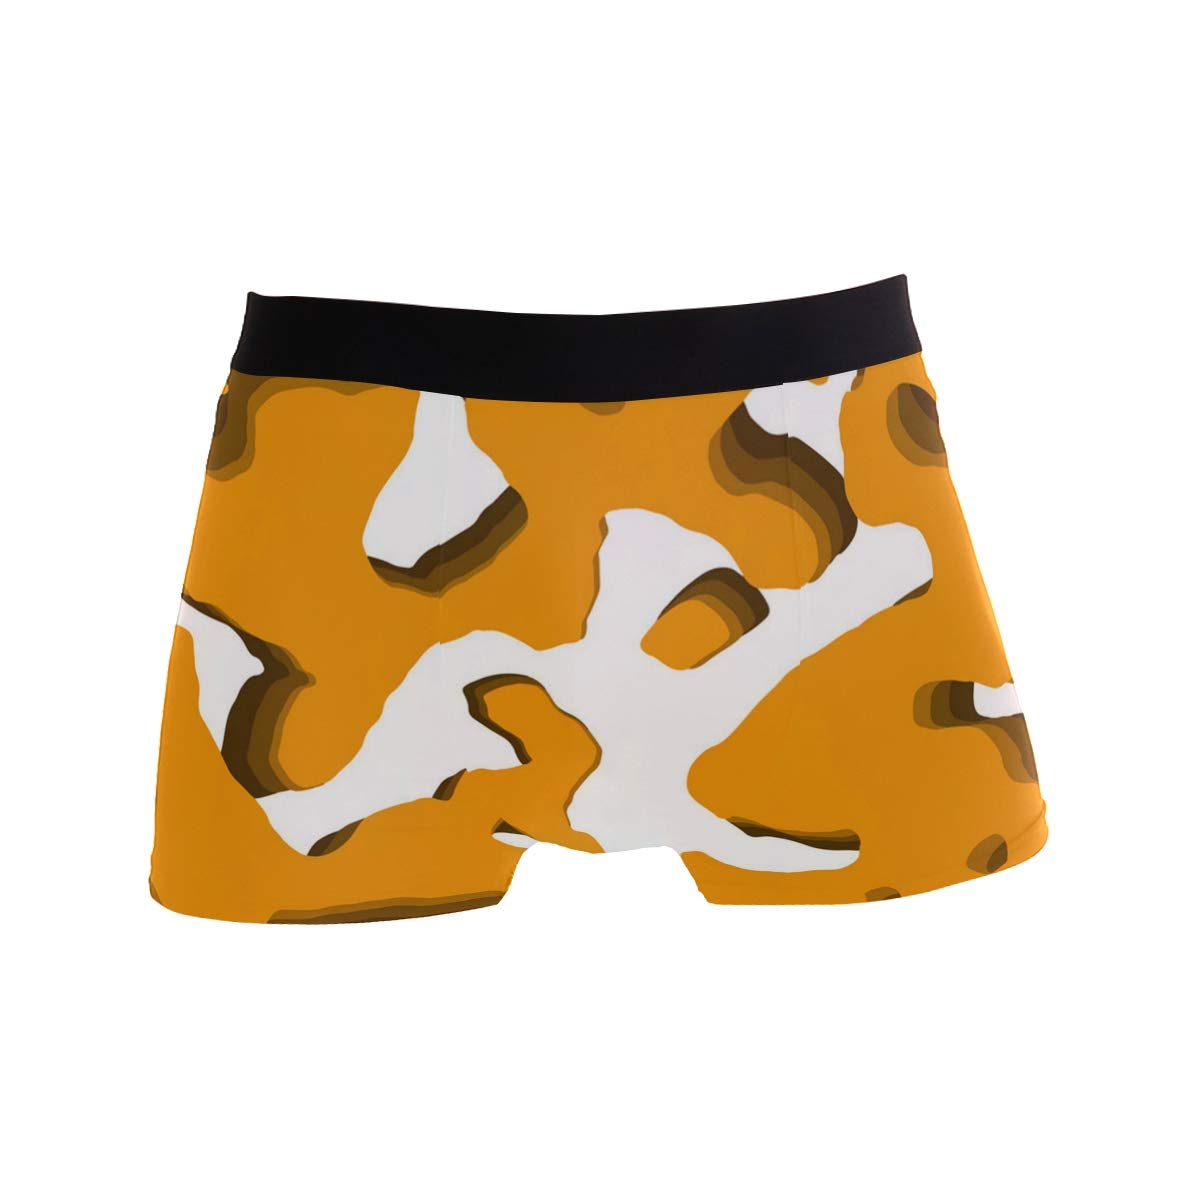 Charlley Lee Mens Soft Breathable 3 Underwear Boxer Briefs